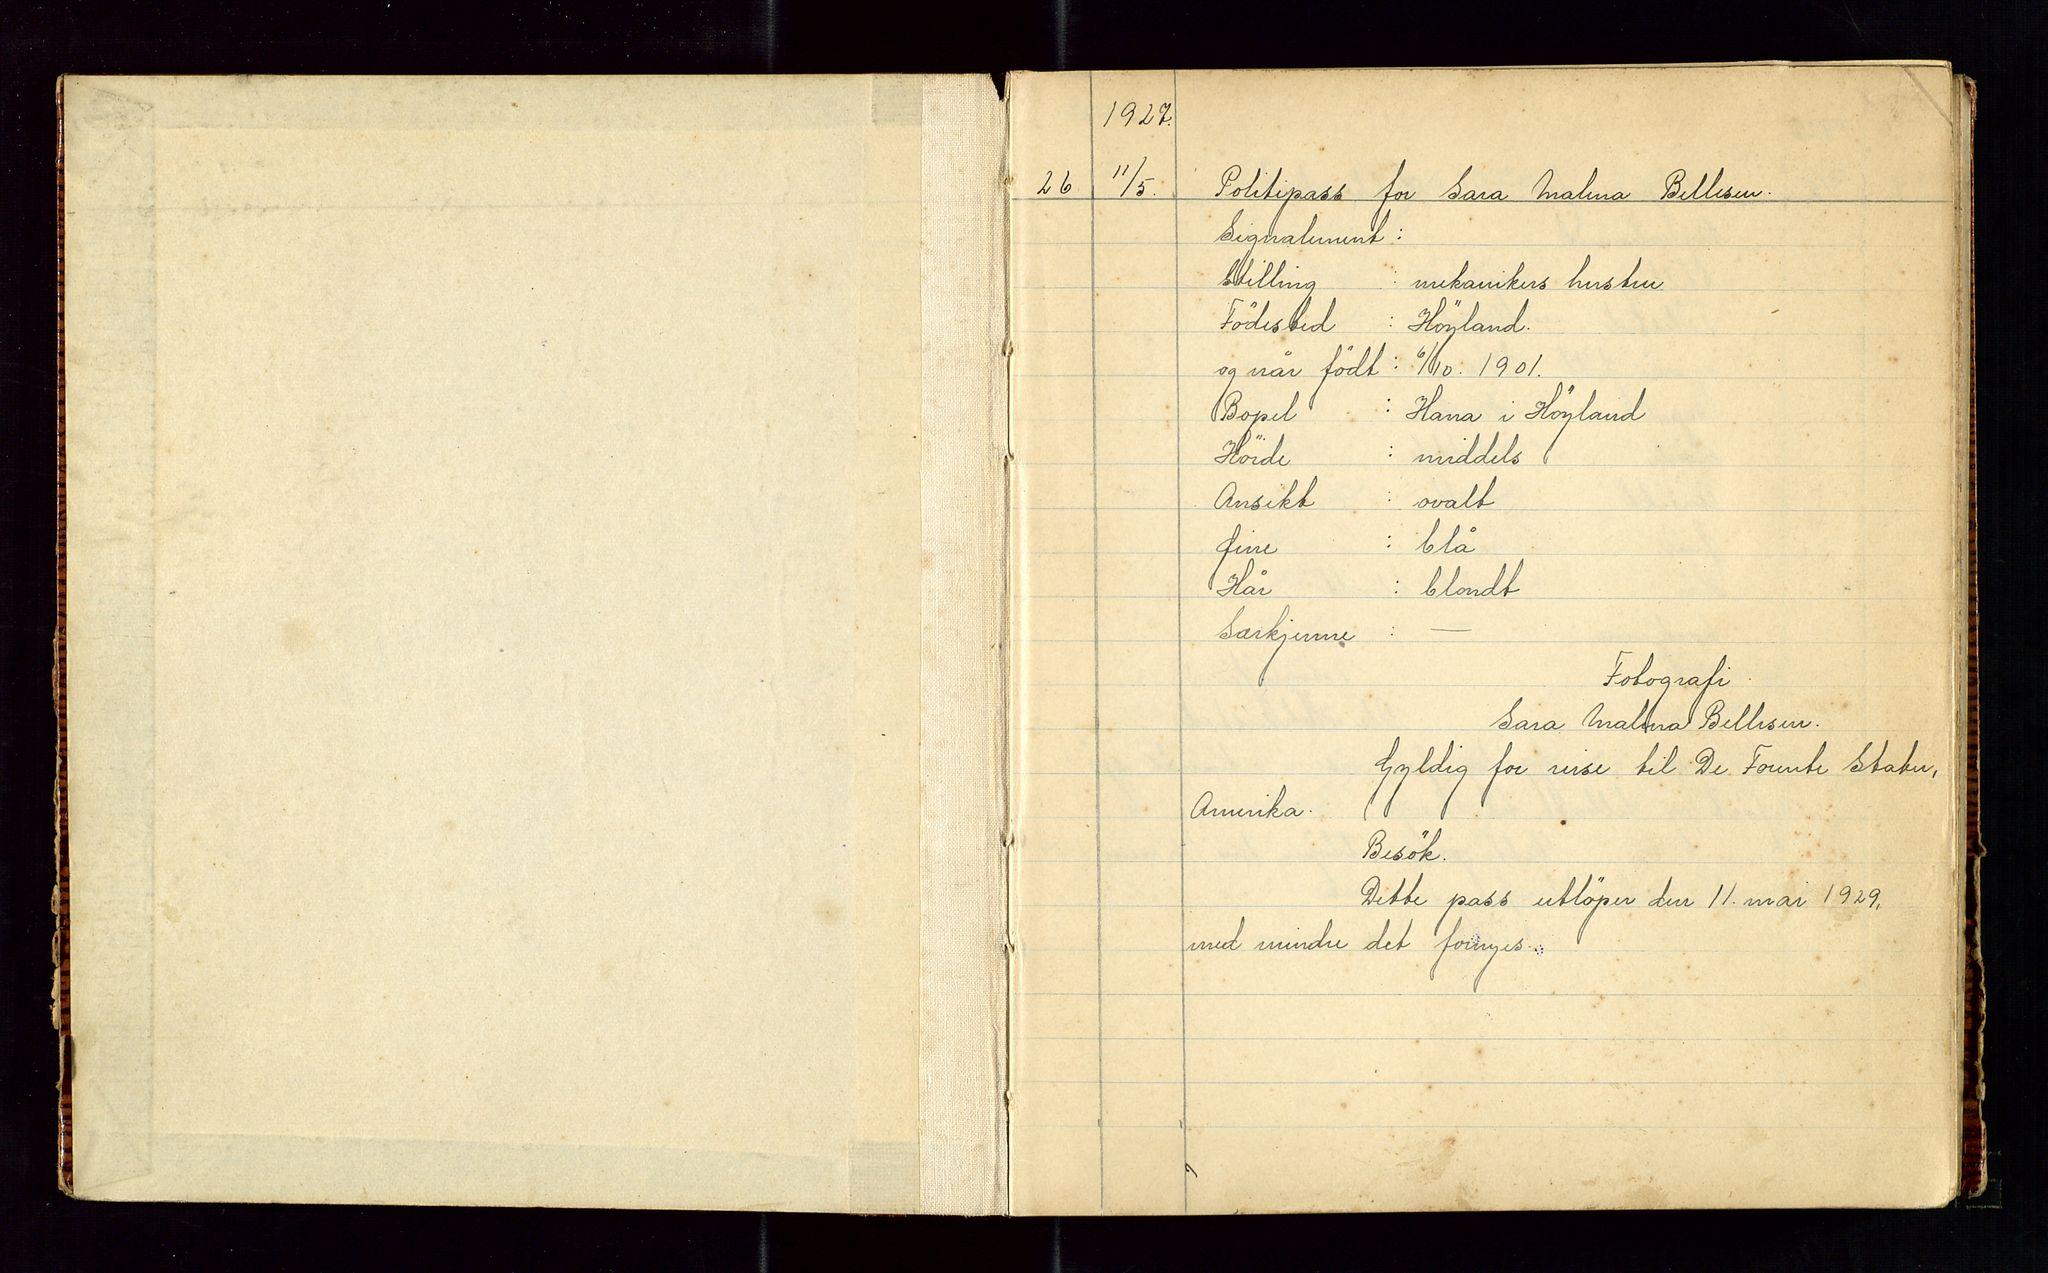 SAST, Sandnes politikammer, K/L0004: Passprotokoll, 1927-1934, s. 2